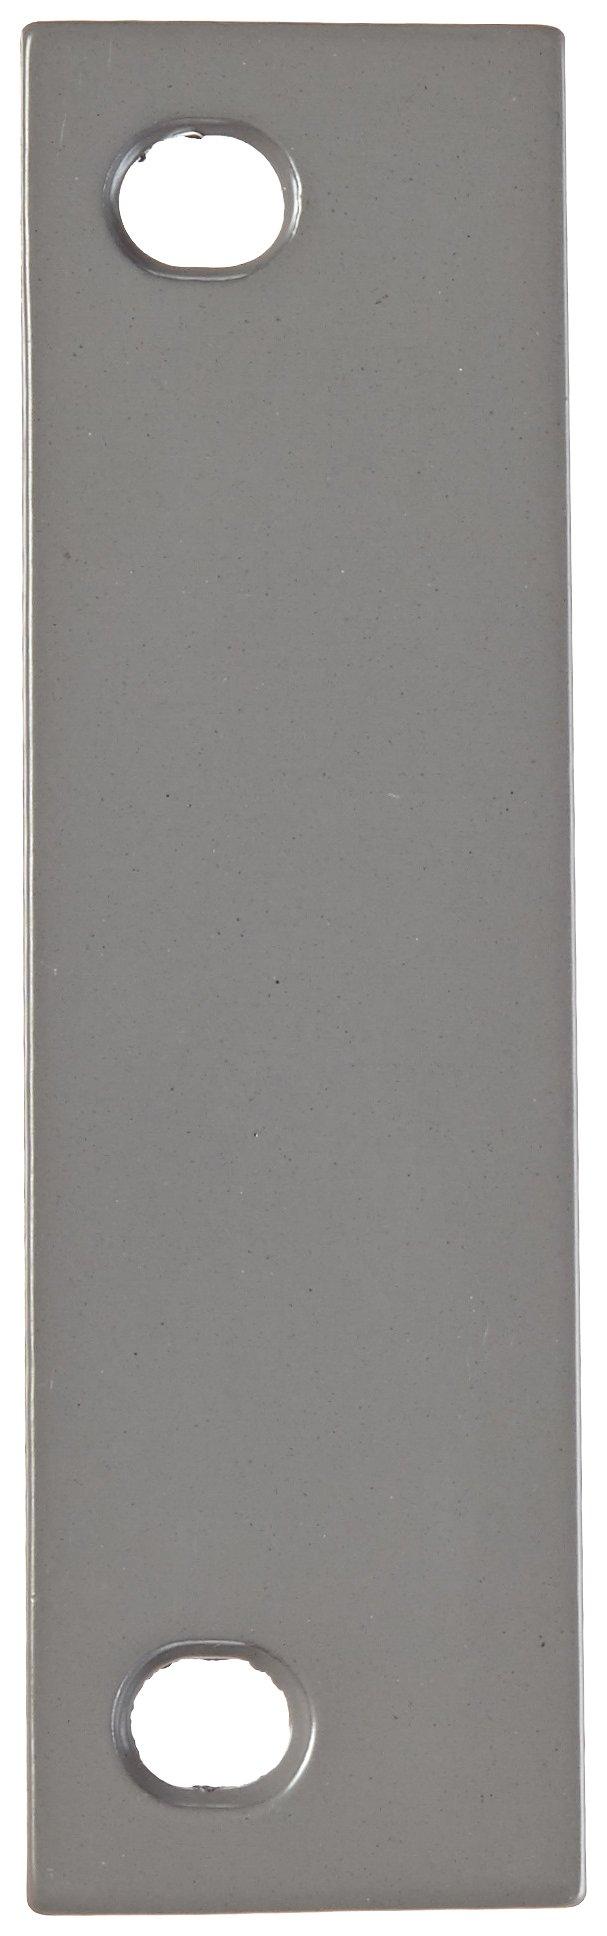 Rockwood DHF5B Steel Beveled Door Hinge Filler Plate, 1-1/2'' Width x 5'' Height, Prime Coat Finish (Pack of 25)